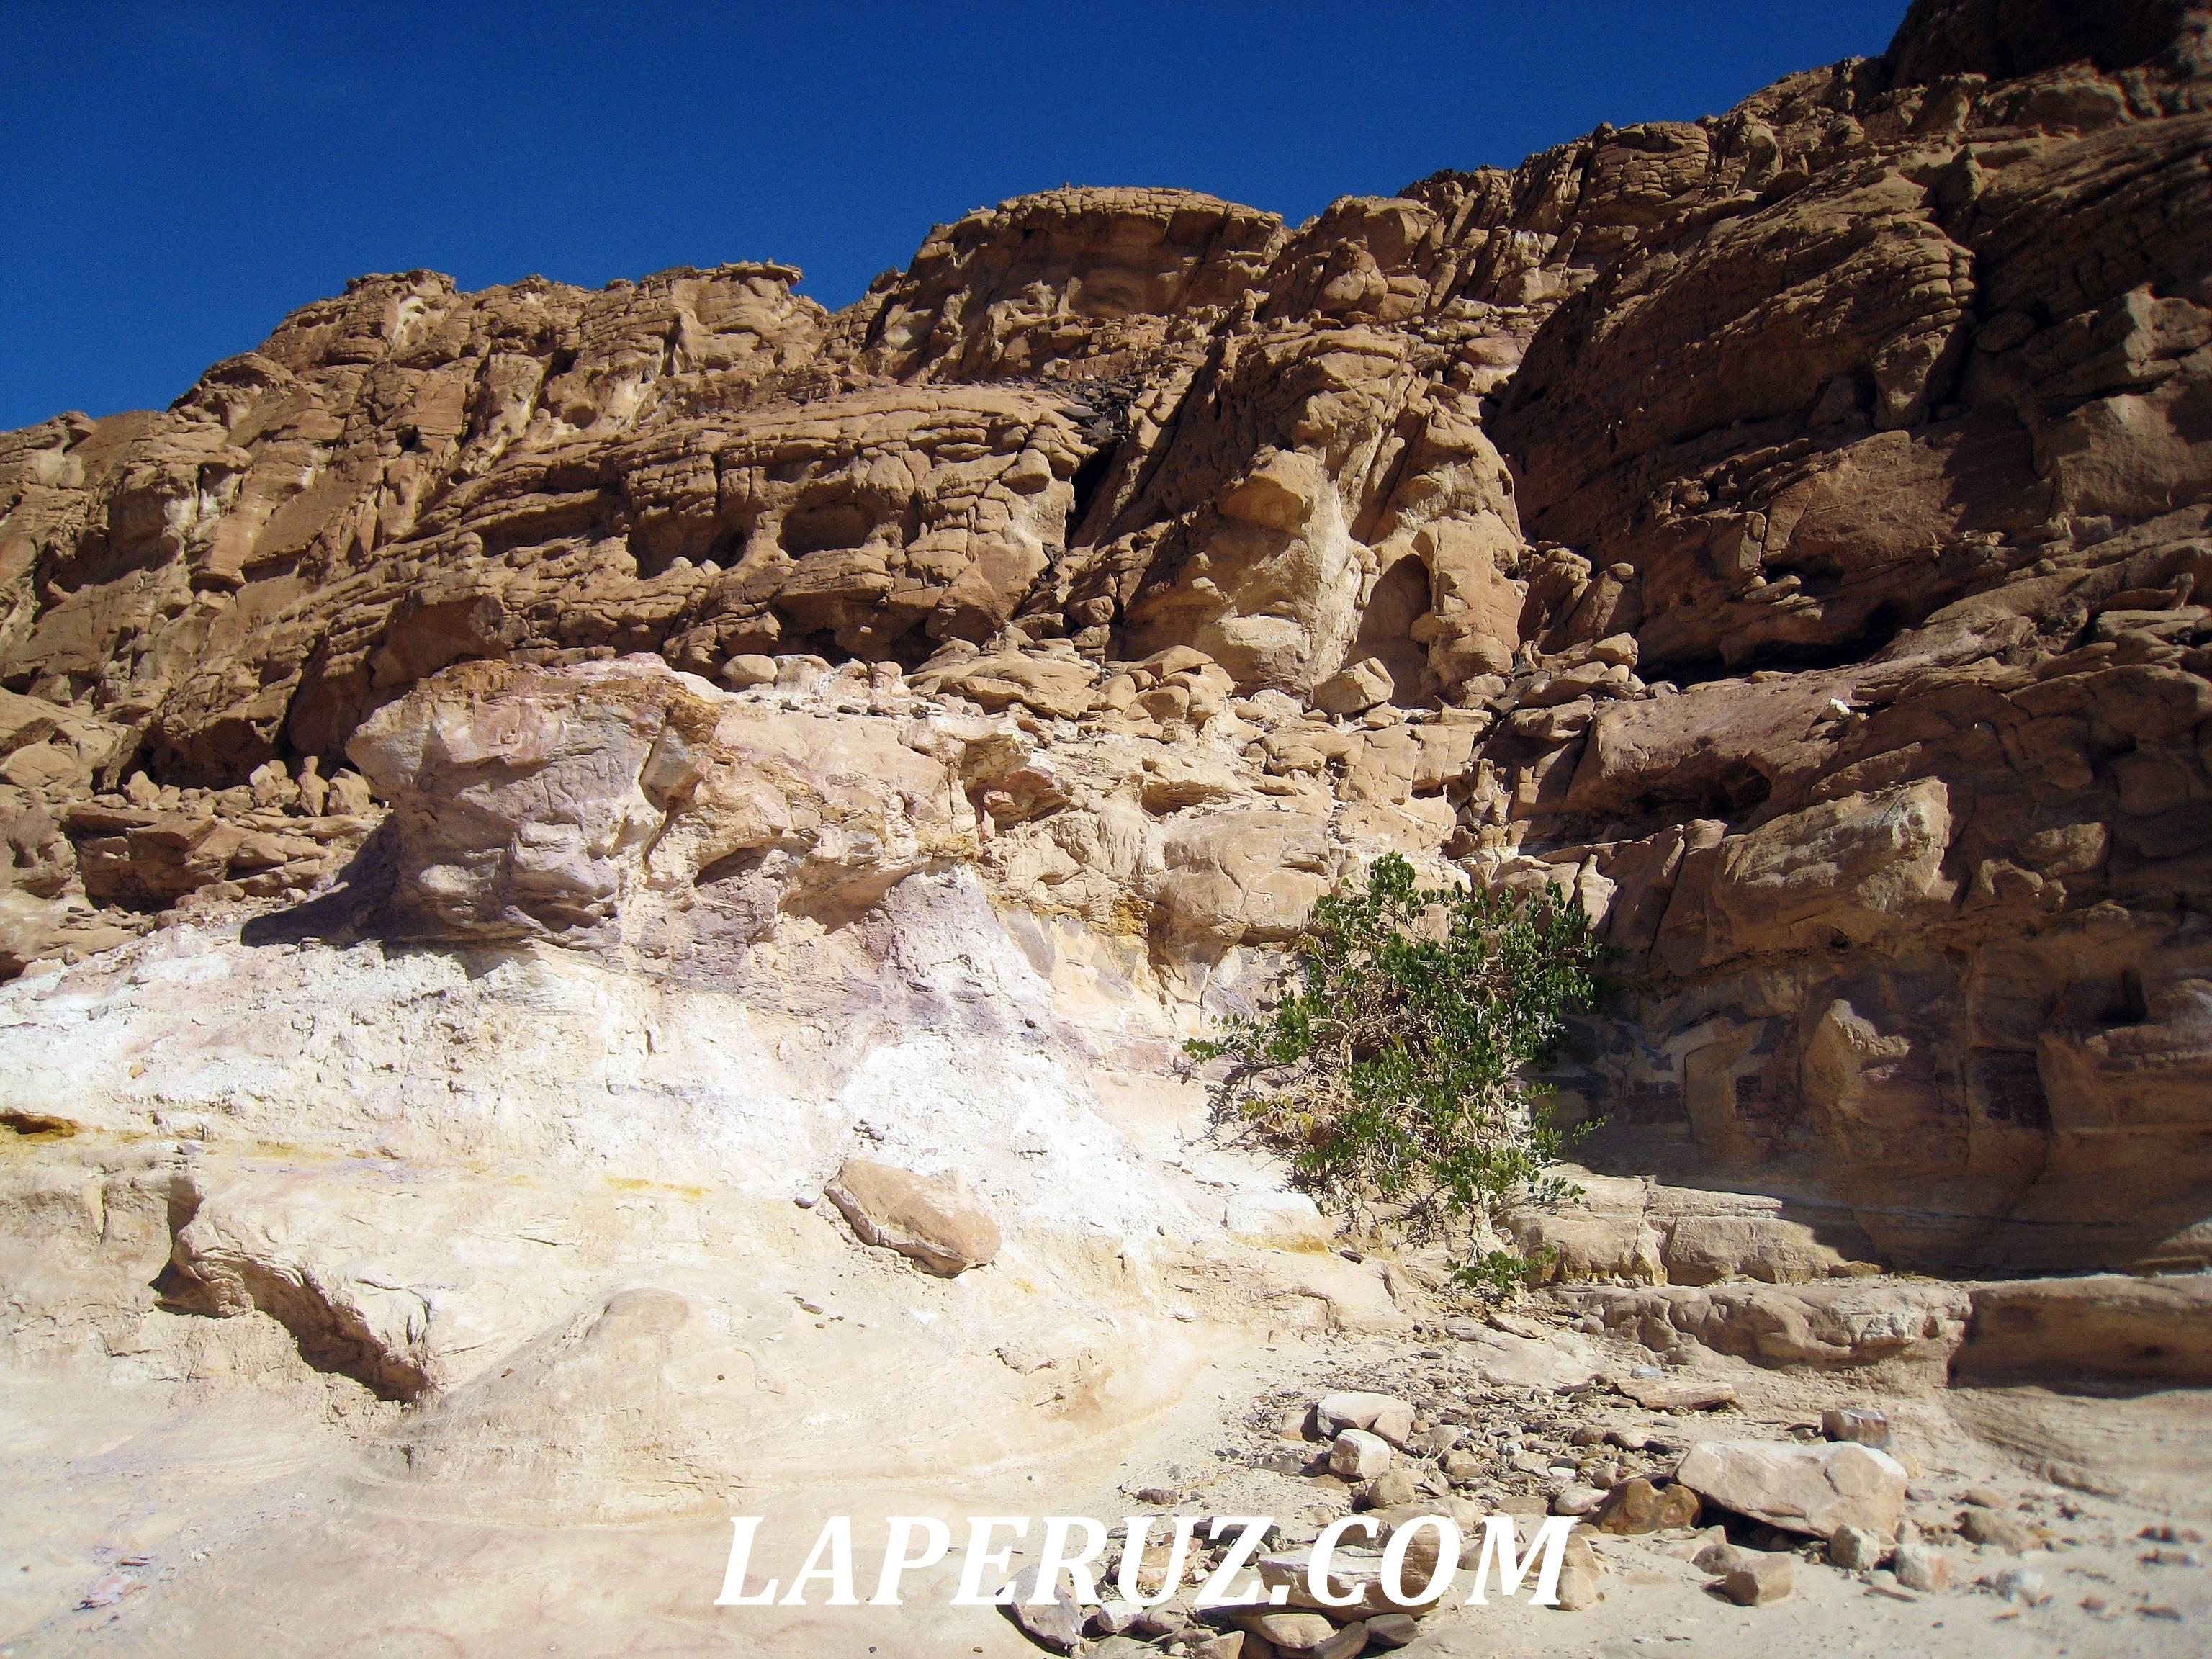 cvetnoi_kanyon_egypt_2